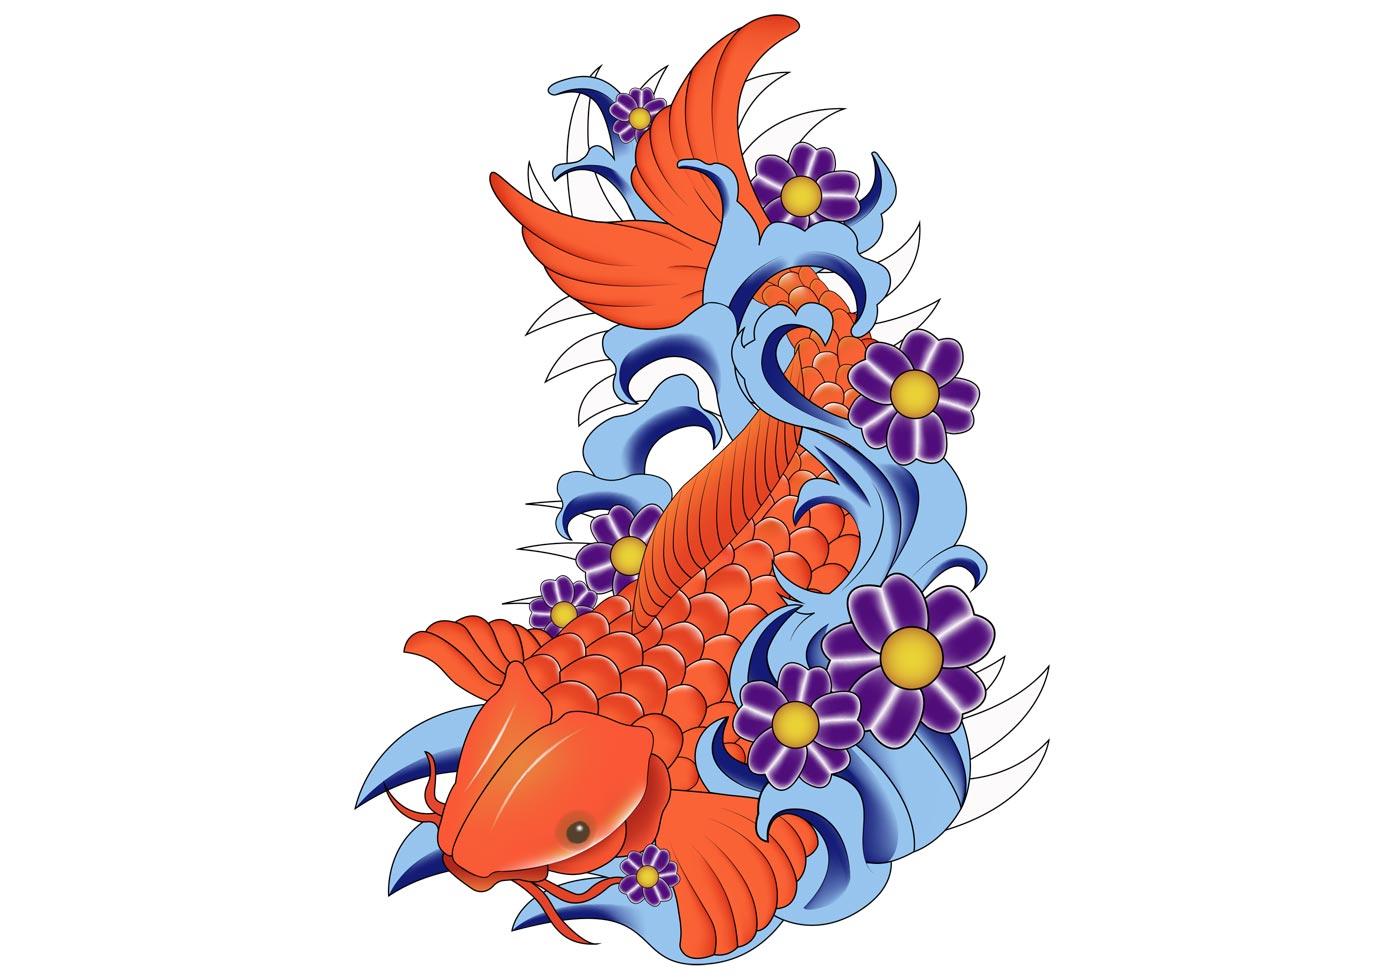 Cute Dolphin Drawing Wallpaper Koi Fish Vector Free Vector Art At Vecteezy